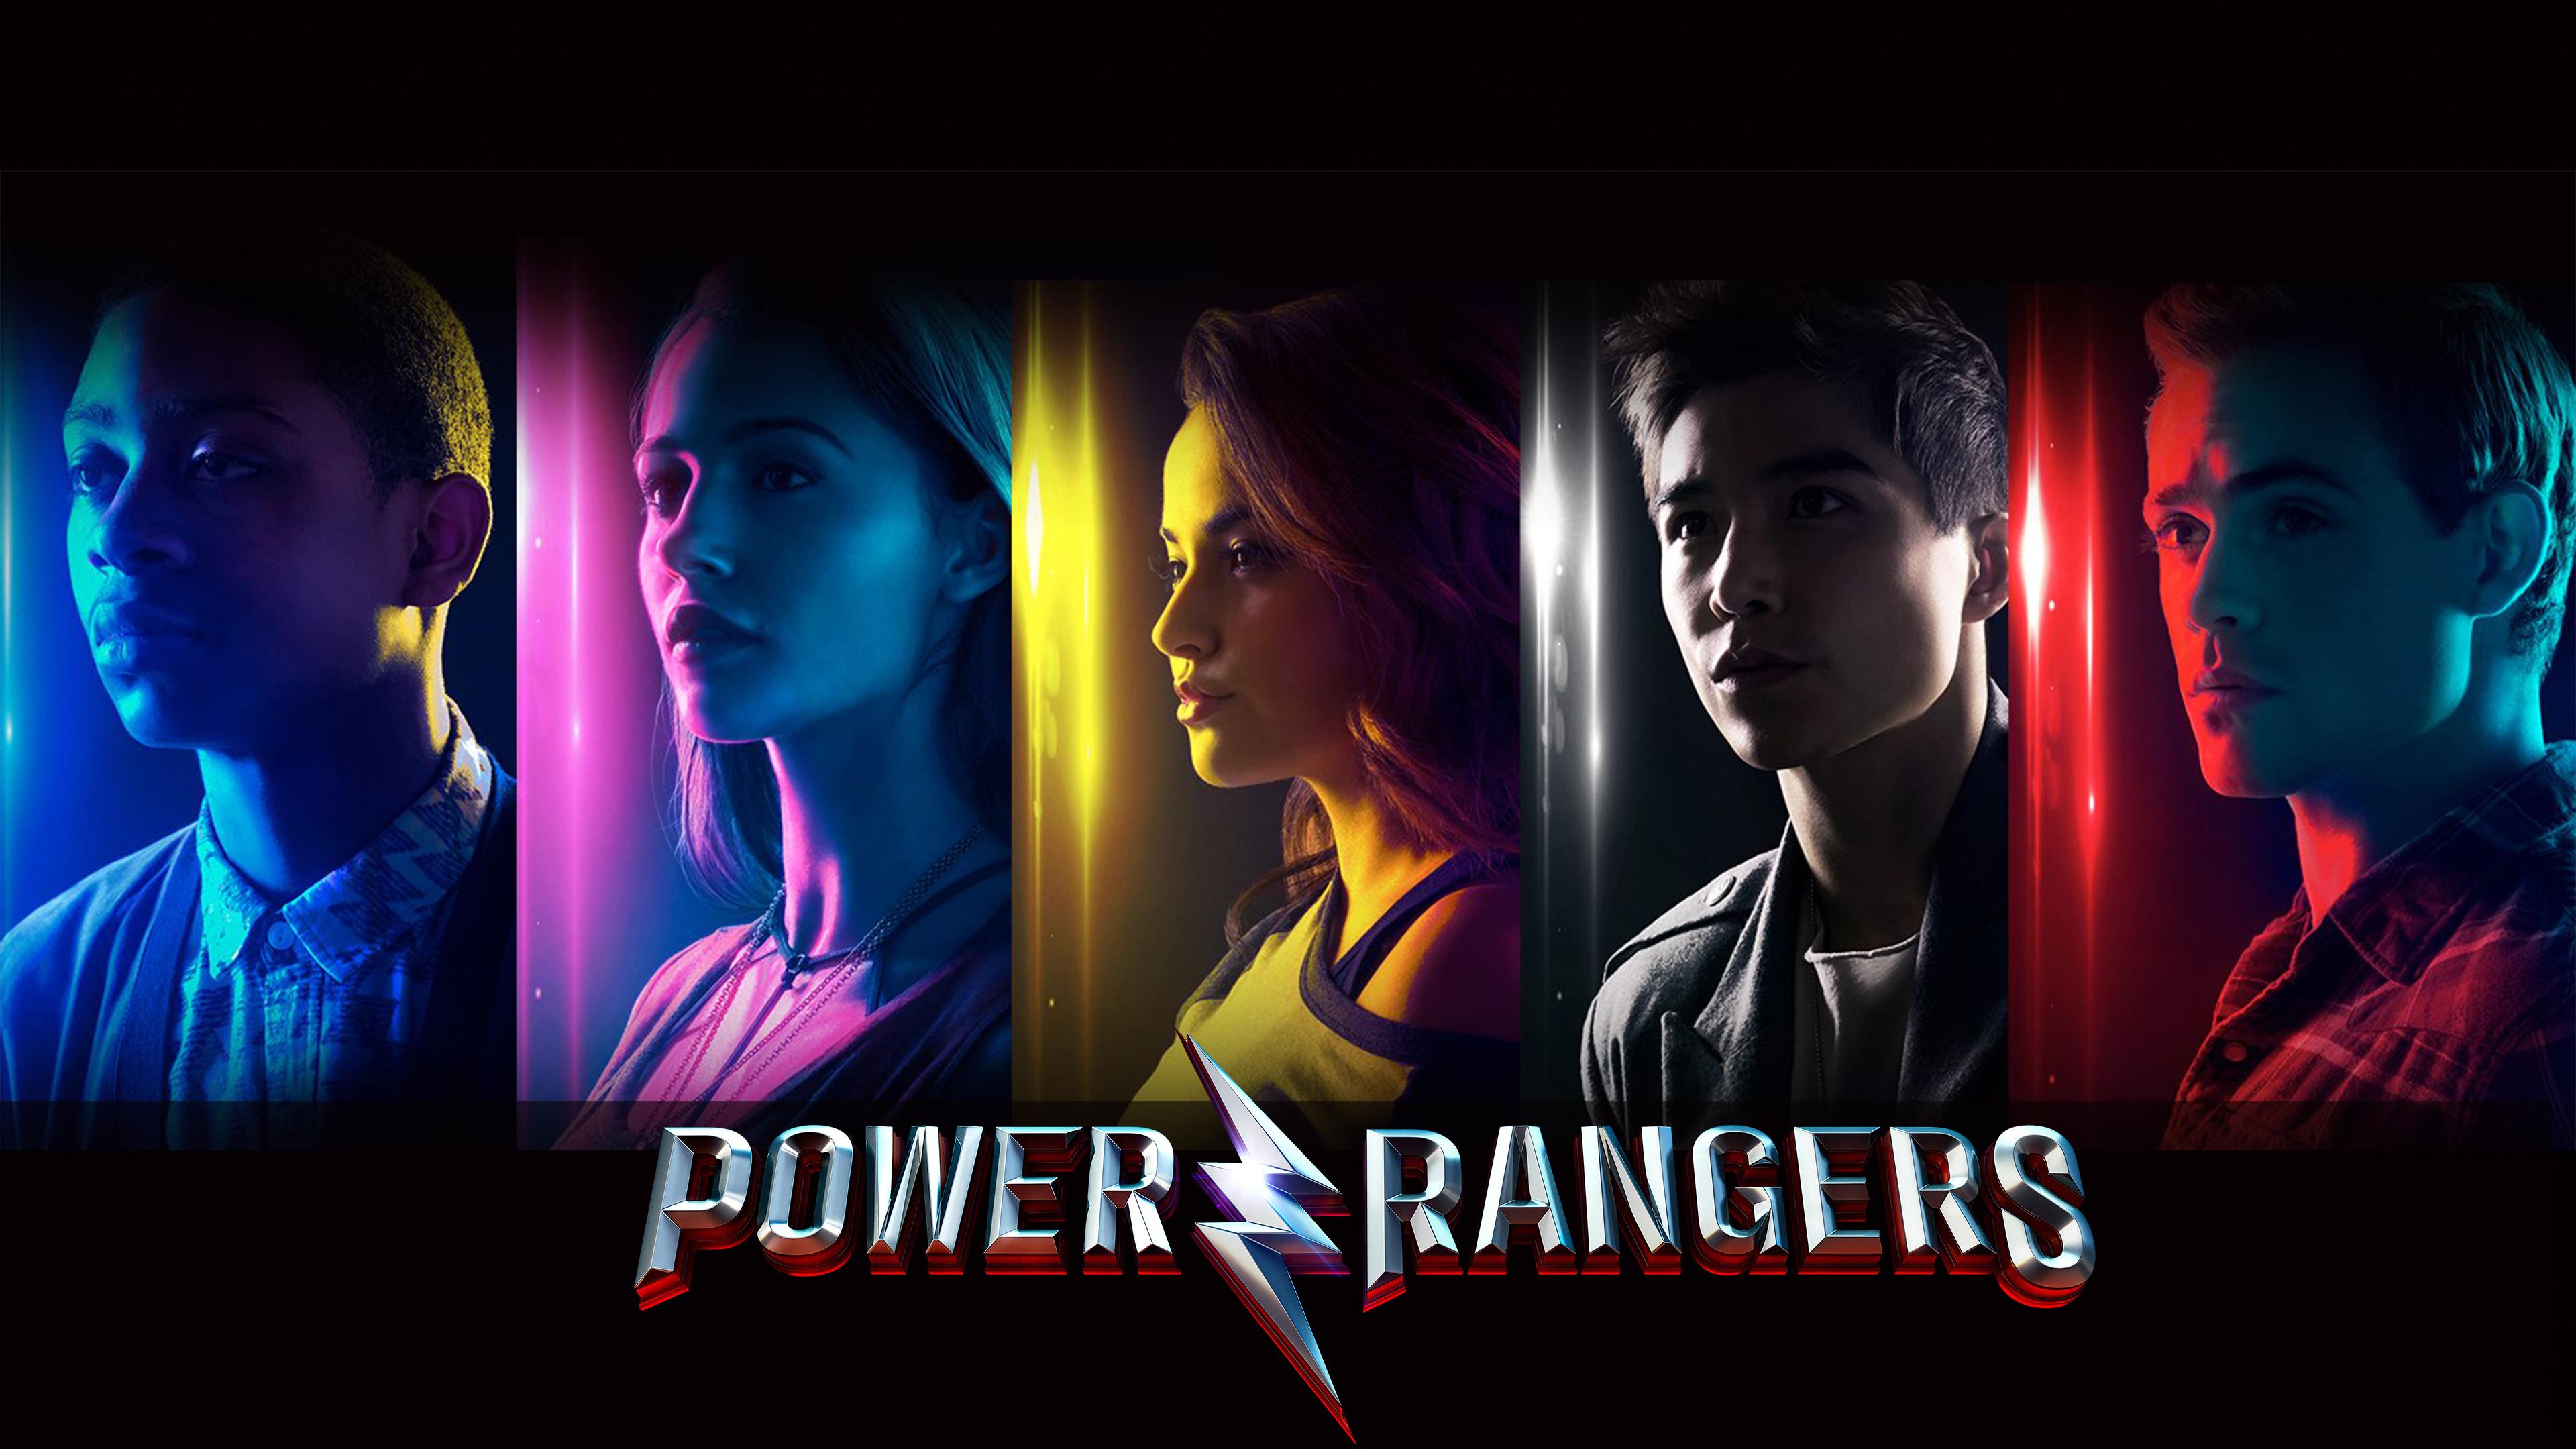 Power Rangers 2017 Movie 4k, HD Movies, 4k Wallpapers ...